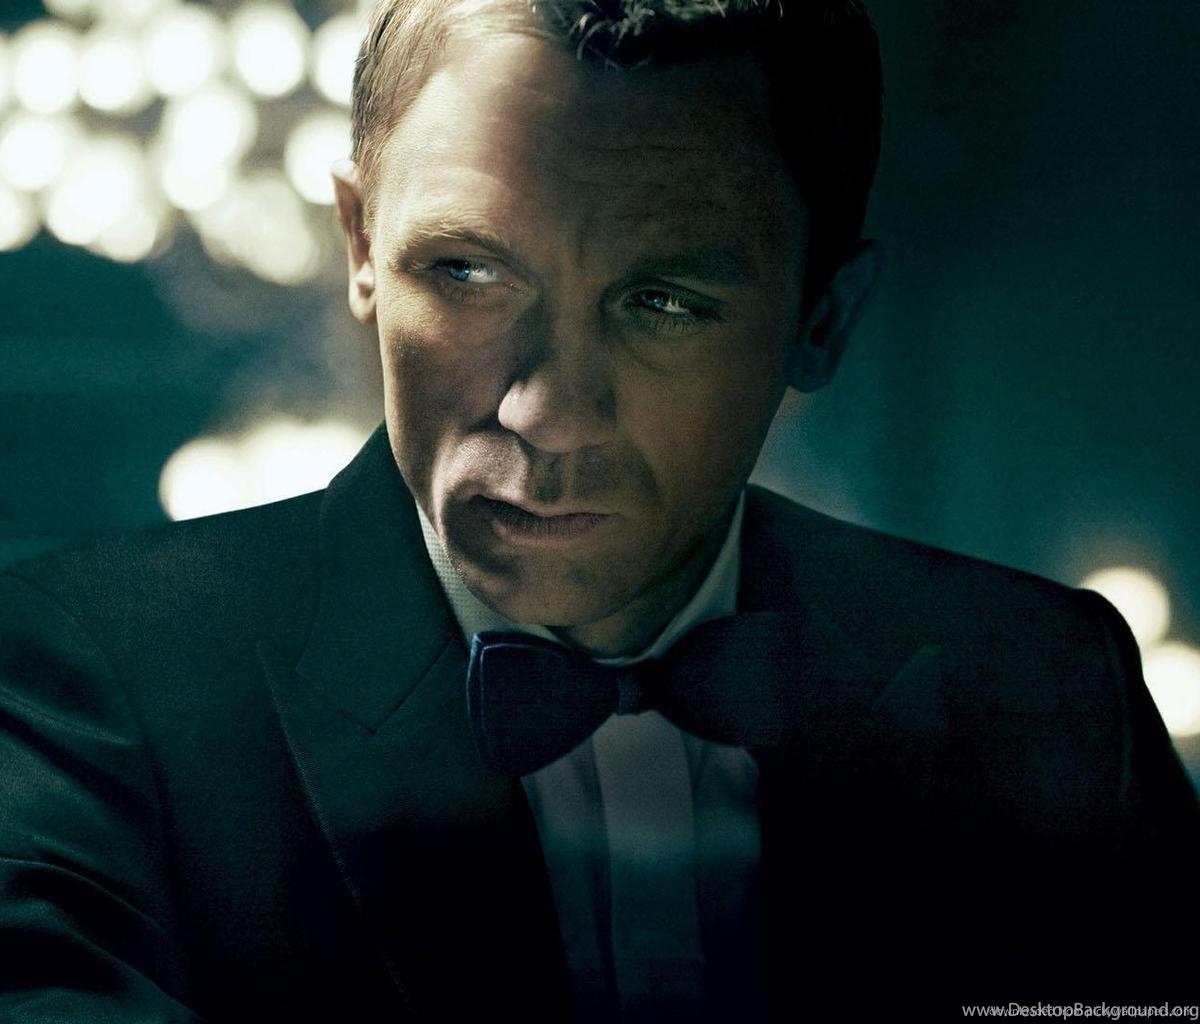 007 casino royale download ita